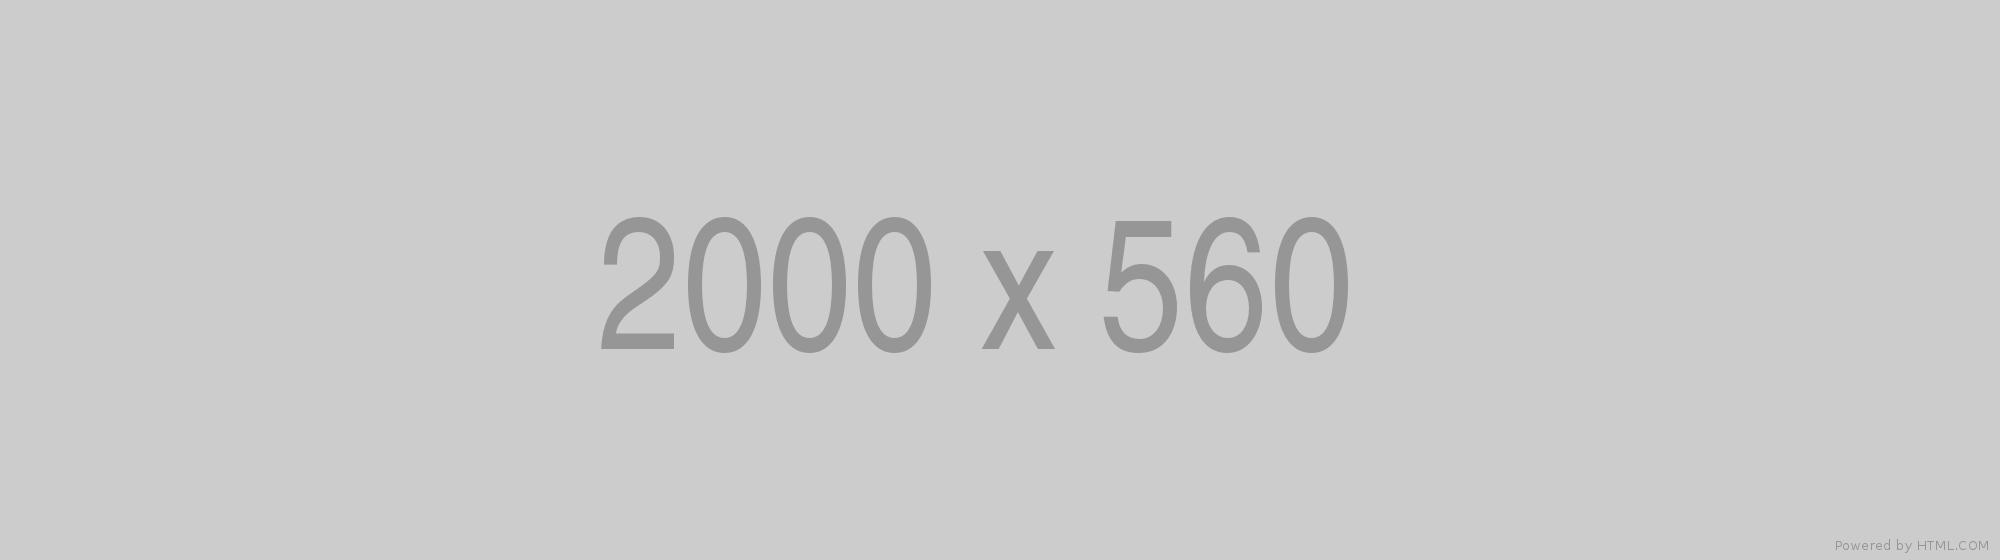 2000x560